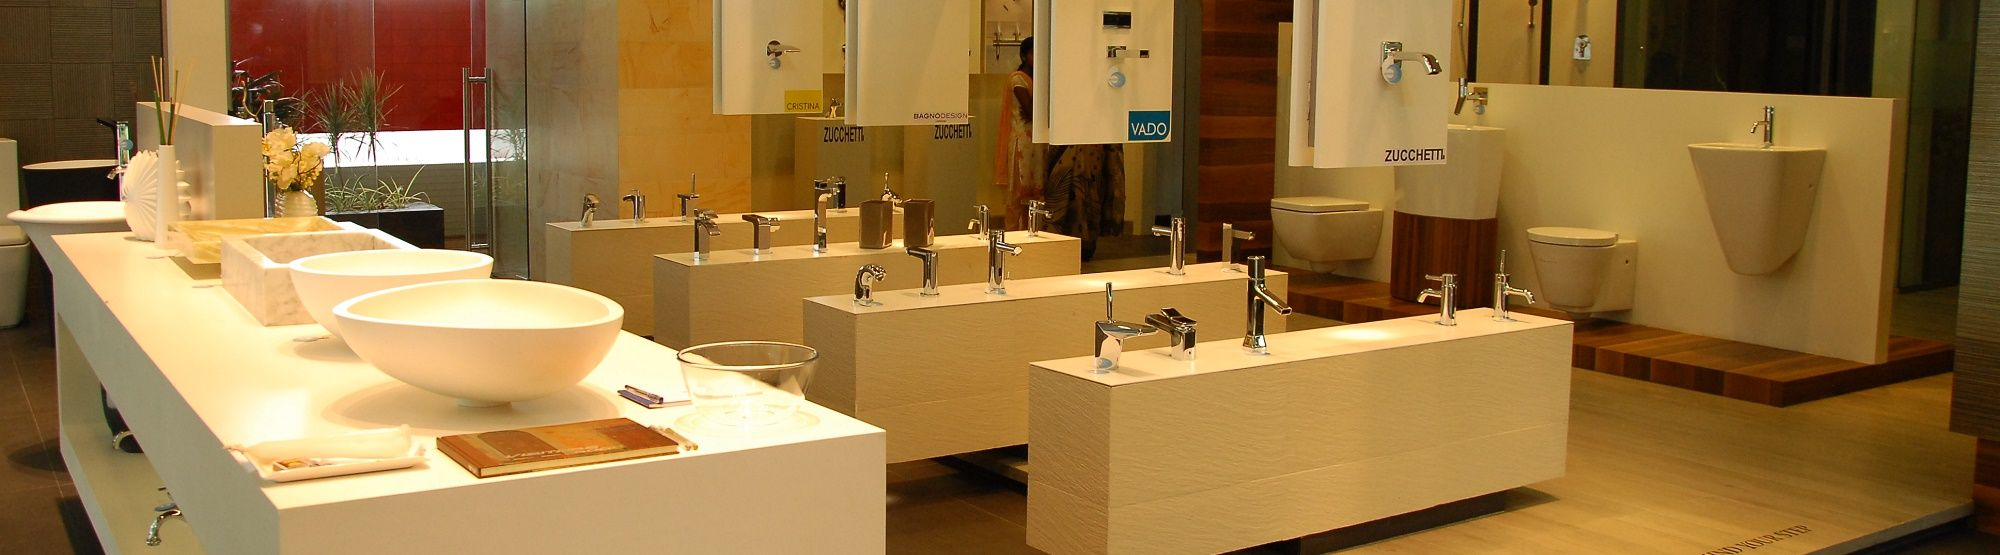 unispace is hyderabads only multi brand showroom for bathroom accessories and designs unispace is - Multi Bathroom Design